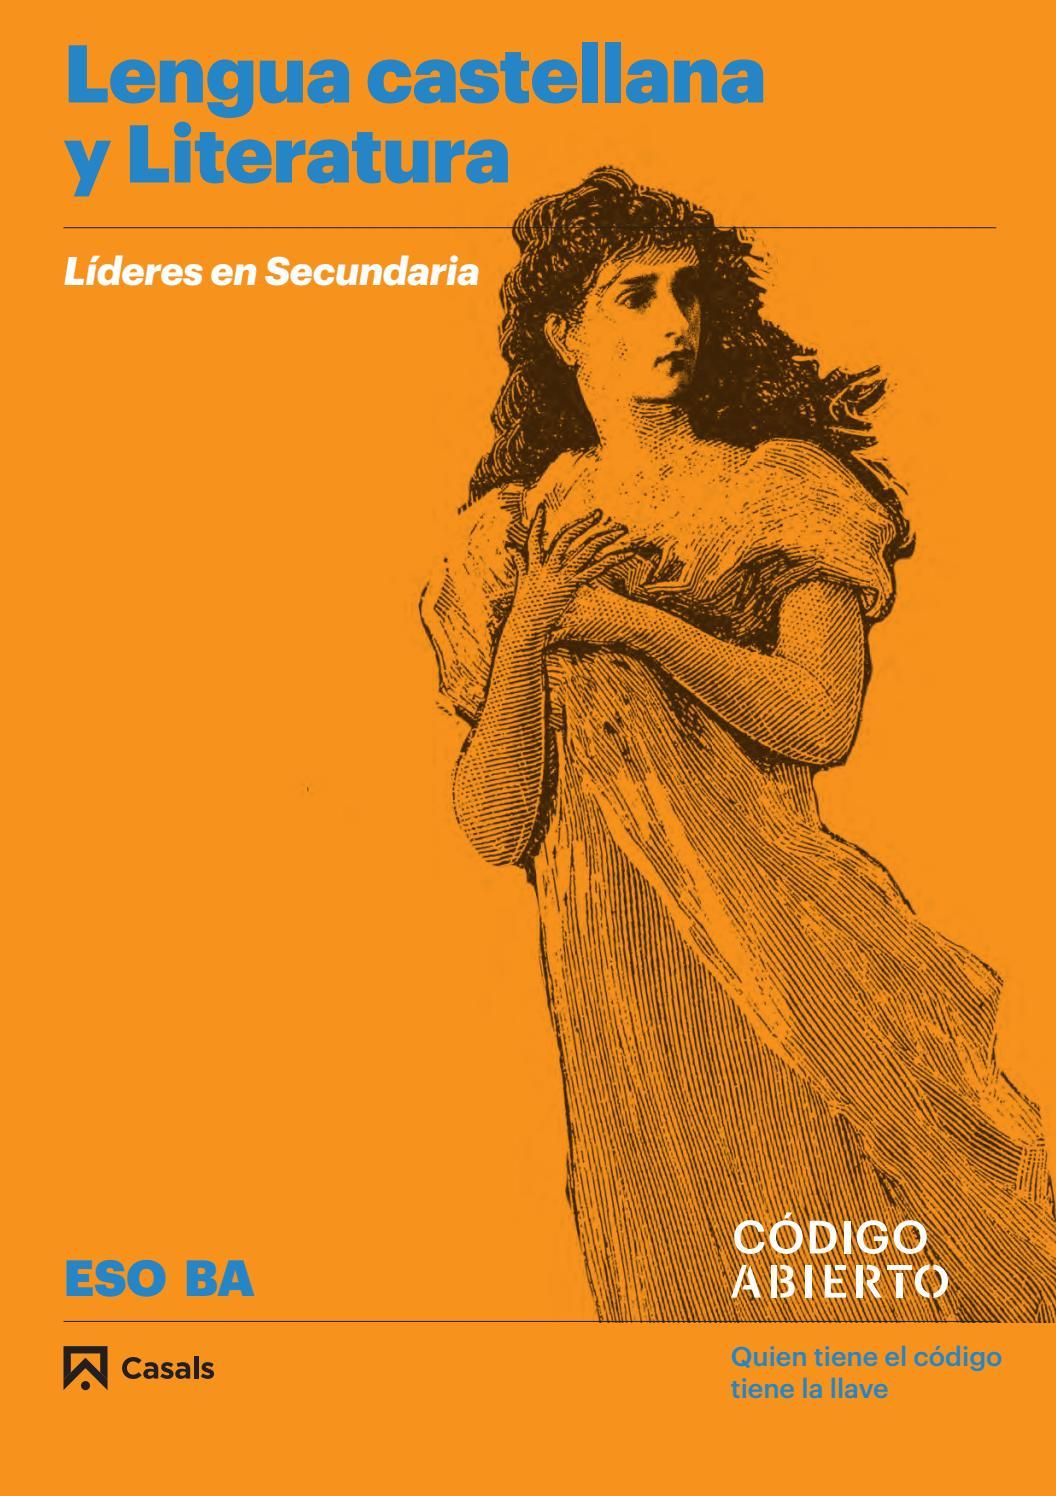 7c3b1452b03d Lengua Castellana y Literatura ESO y Bachillerato by Editorial Casals -  issuu